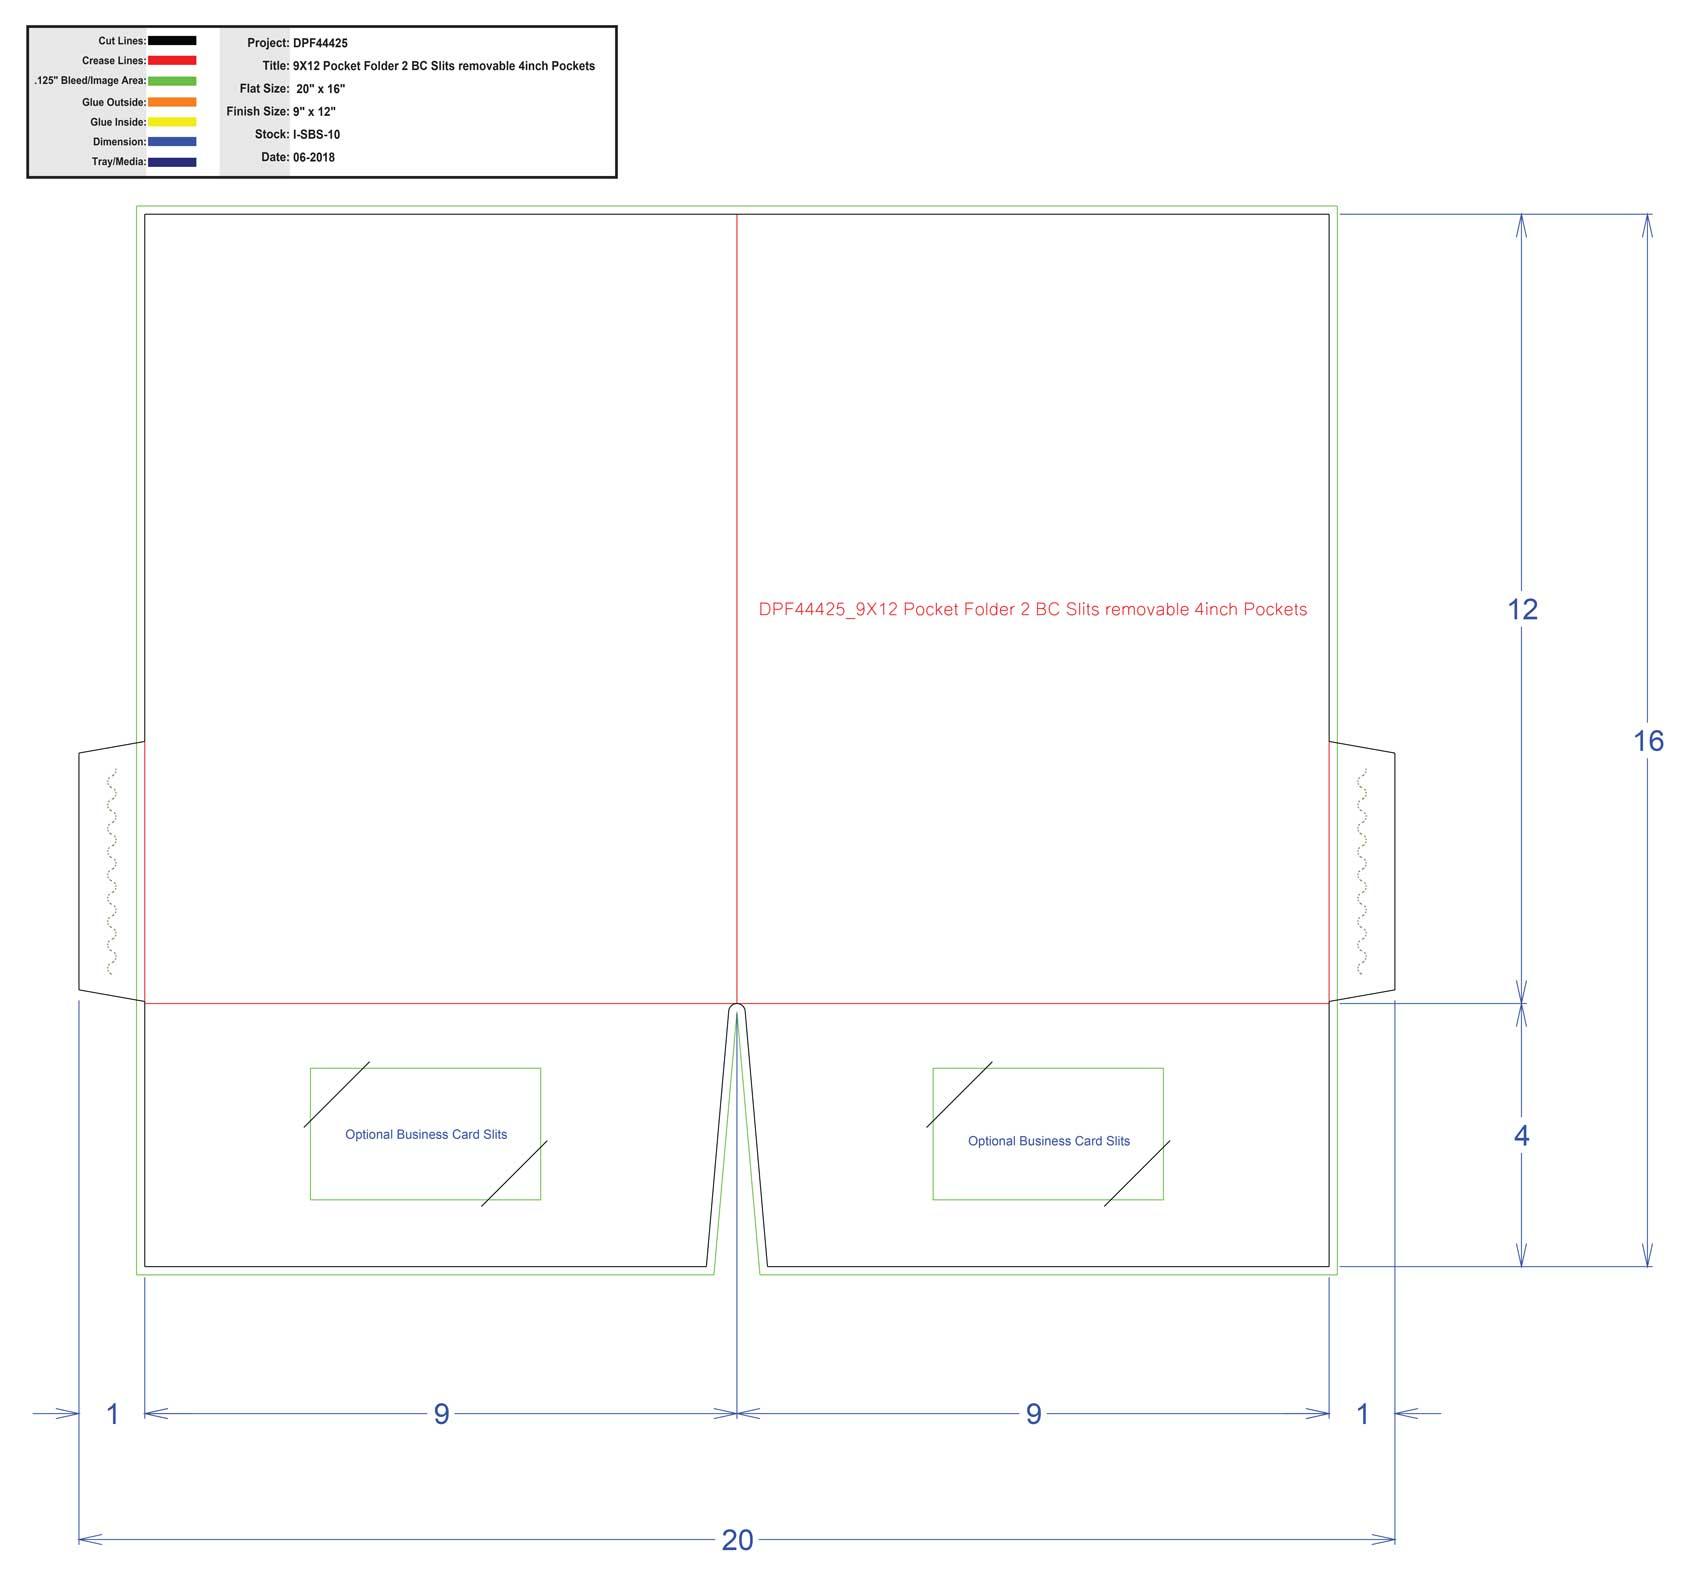 DPF44425 9x12 Pocket Folder 2 BC Slits Removeable 4 - 4 Inch Pockets